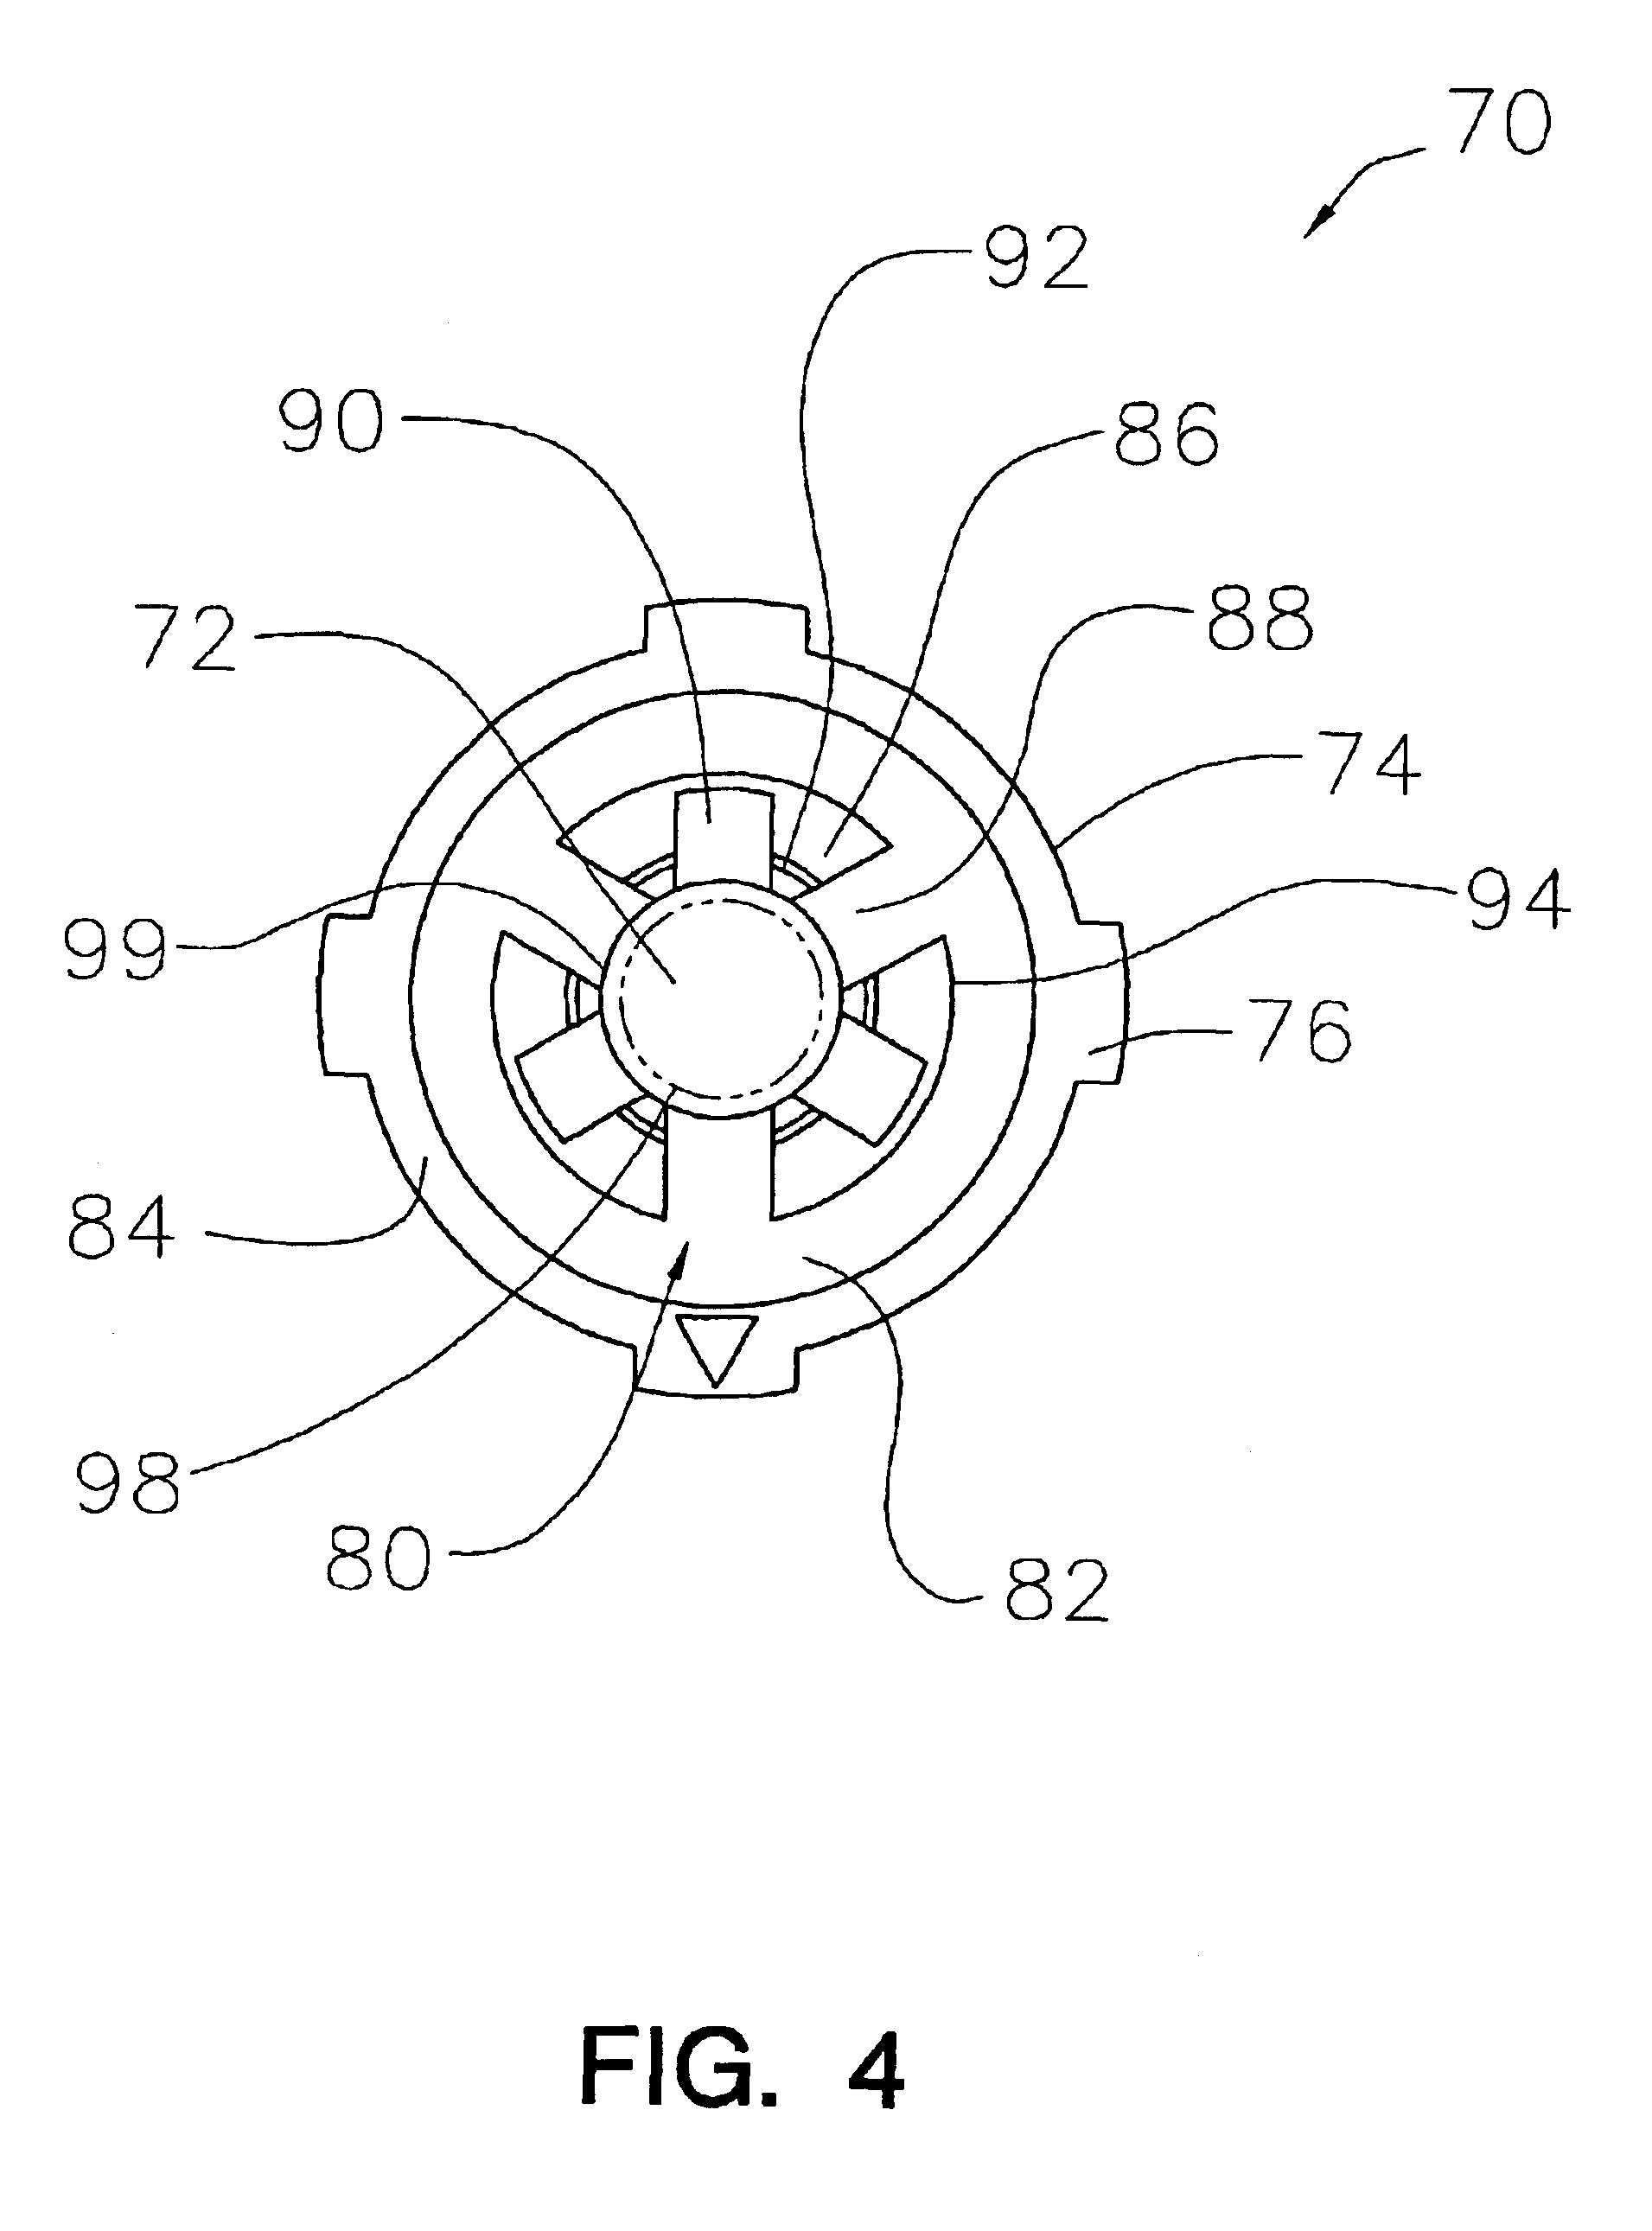 Wiring diagram toyota kijang kapsul us06782725 20040831 d00003 wiring diagram toyota kijang kapsulhtml